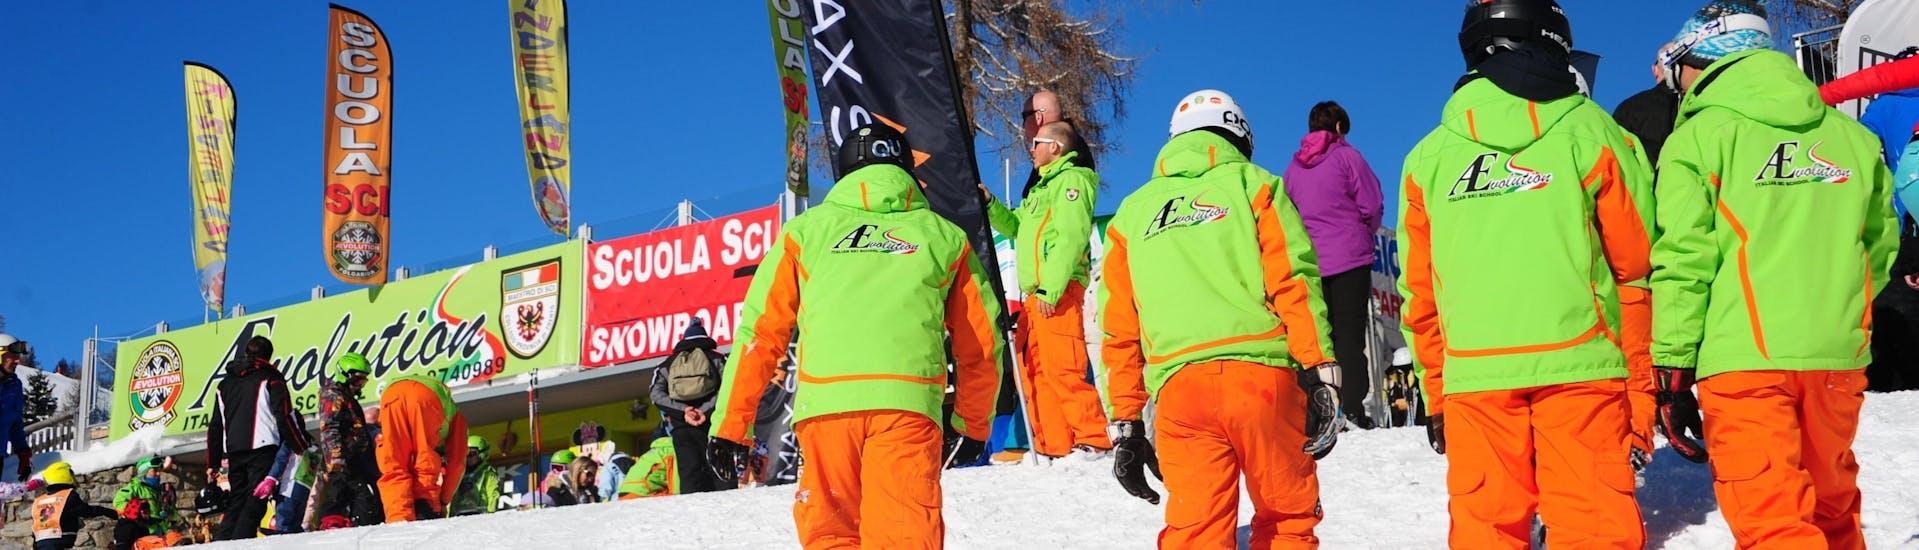 Private Ski Lessons for Adults - All Levels of the Ski School Scuola di Sci Aevolution Folgarida are finished, the ski instructors return to the ski school.